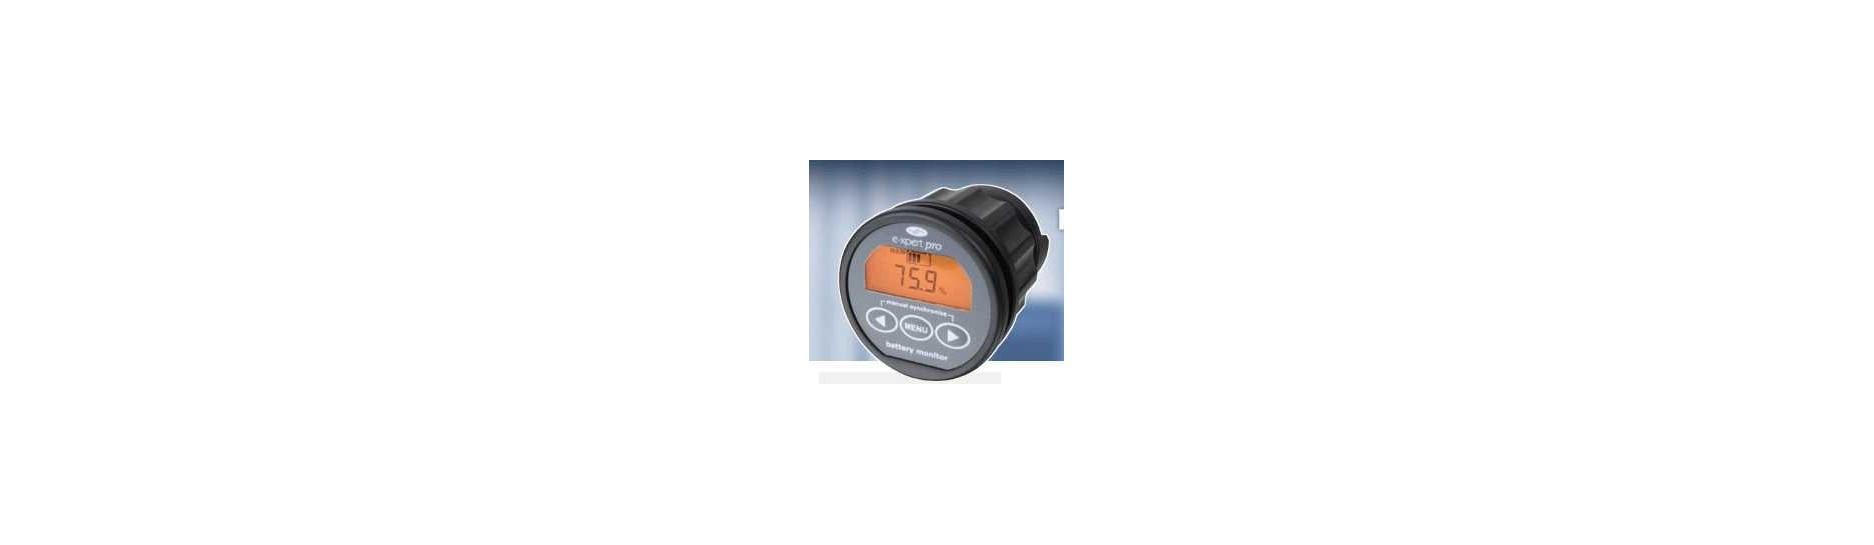 soc meter display display monitor kapacity baterií článků